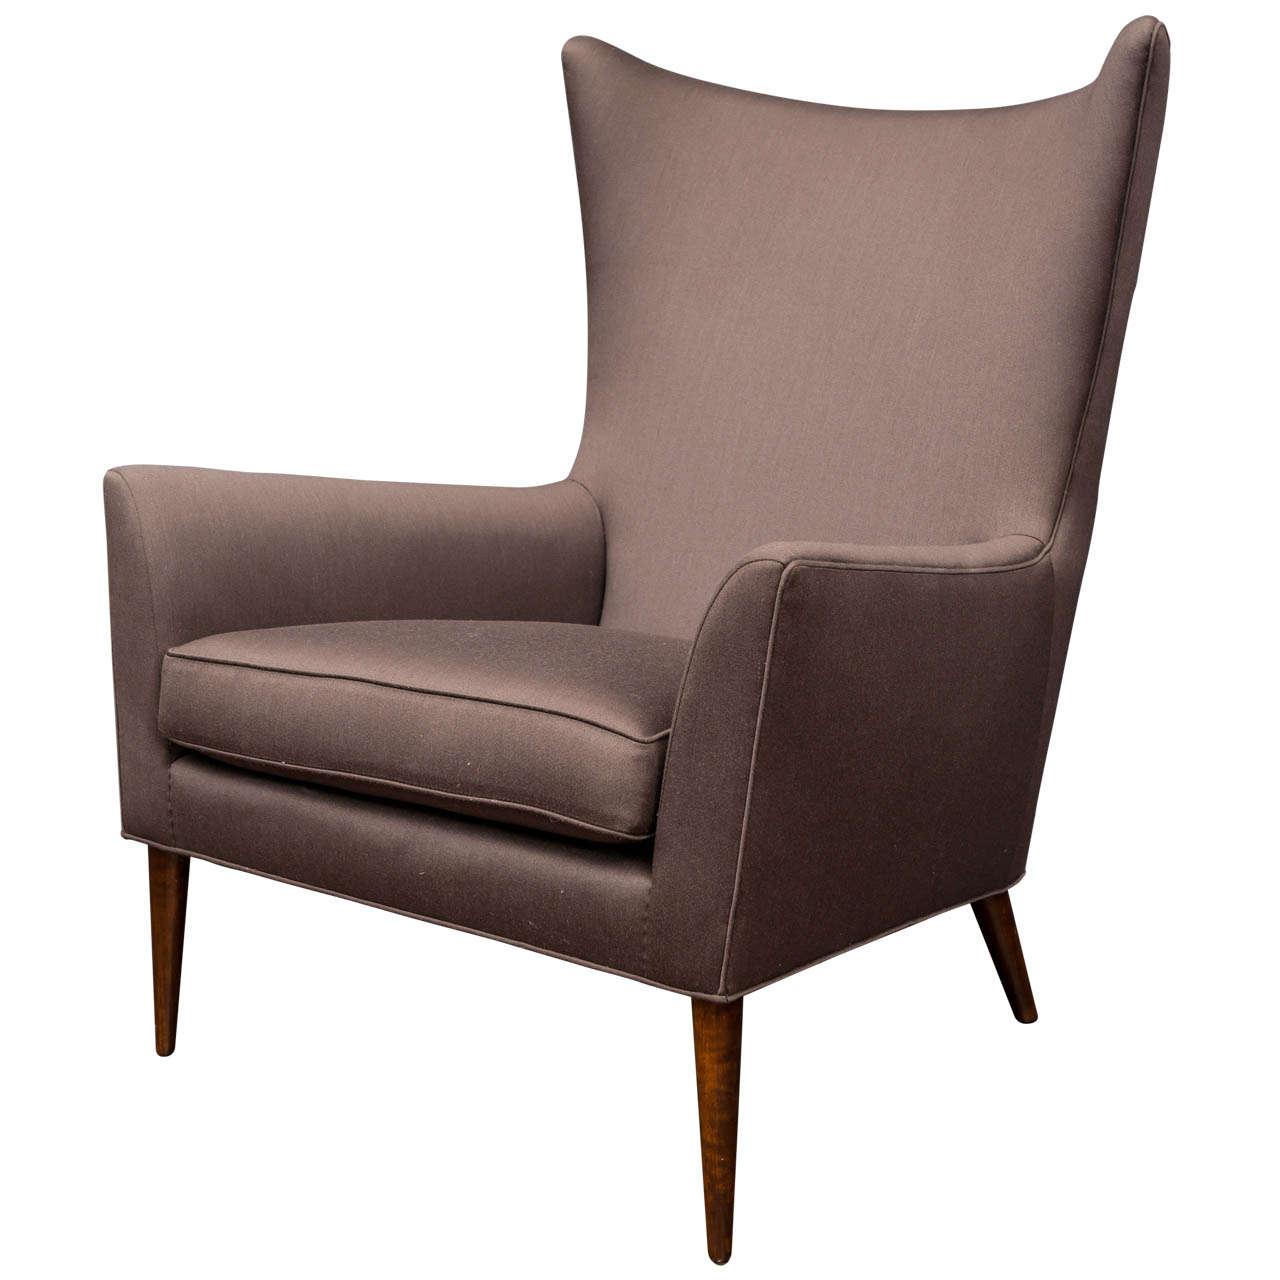 Paul McCobb Wing Chair at 1stdibs